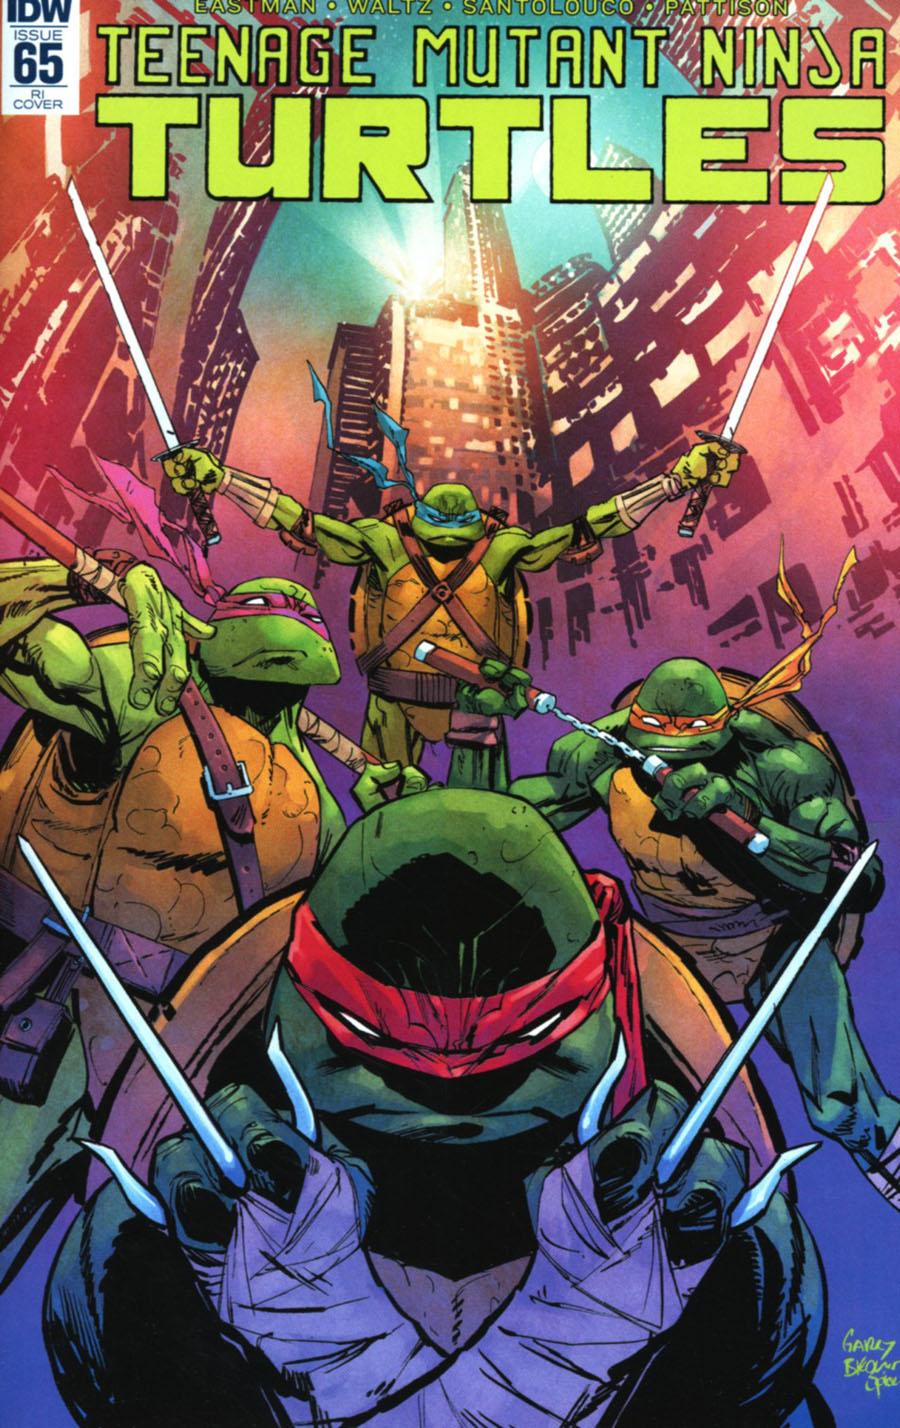 Teenage Mutant Ninja Turtles Vol 5 #65 Cover C Incentive Garry Brown Variant Cover